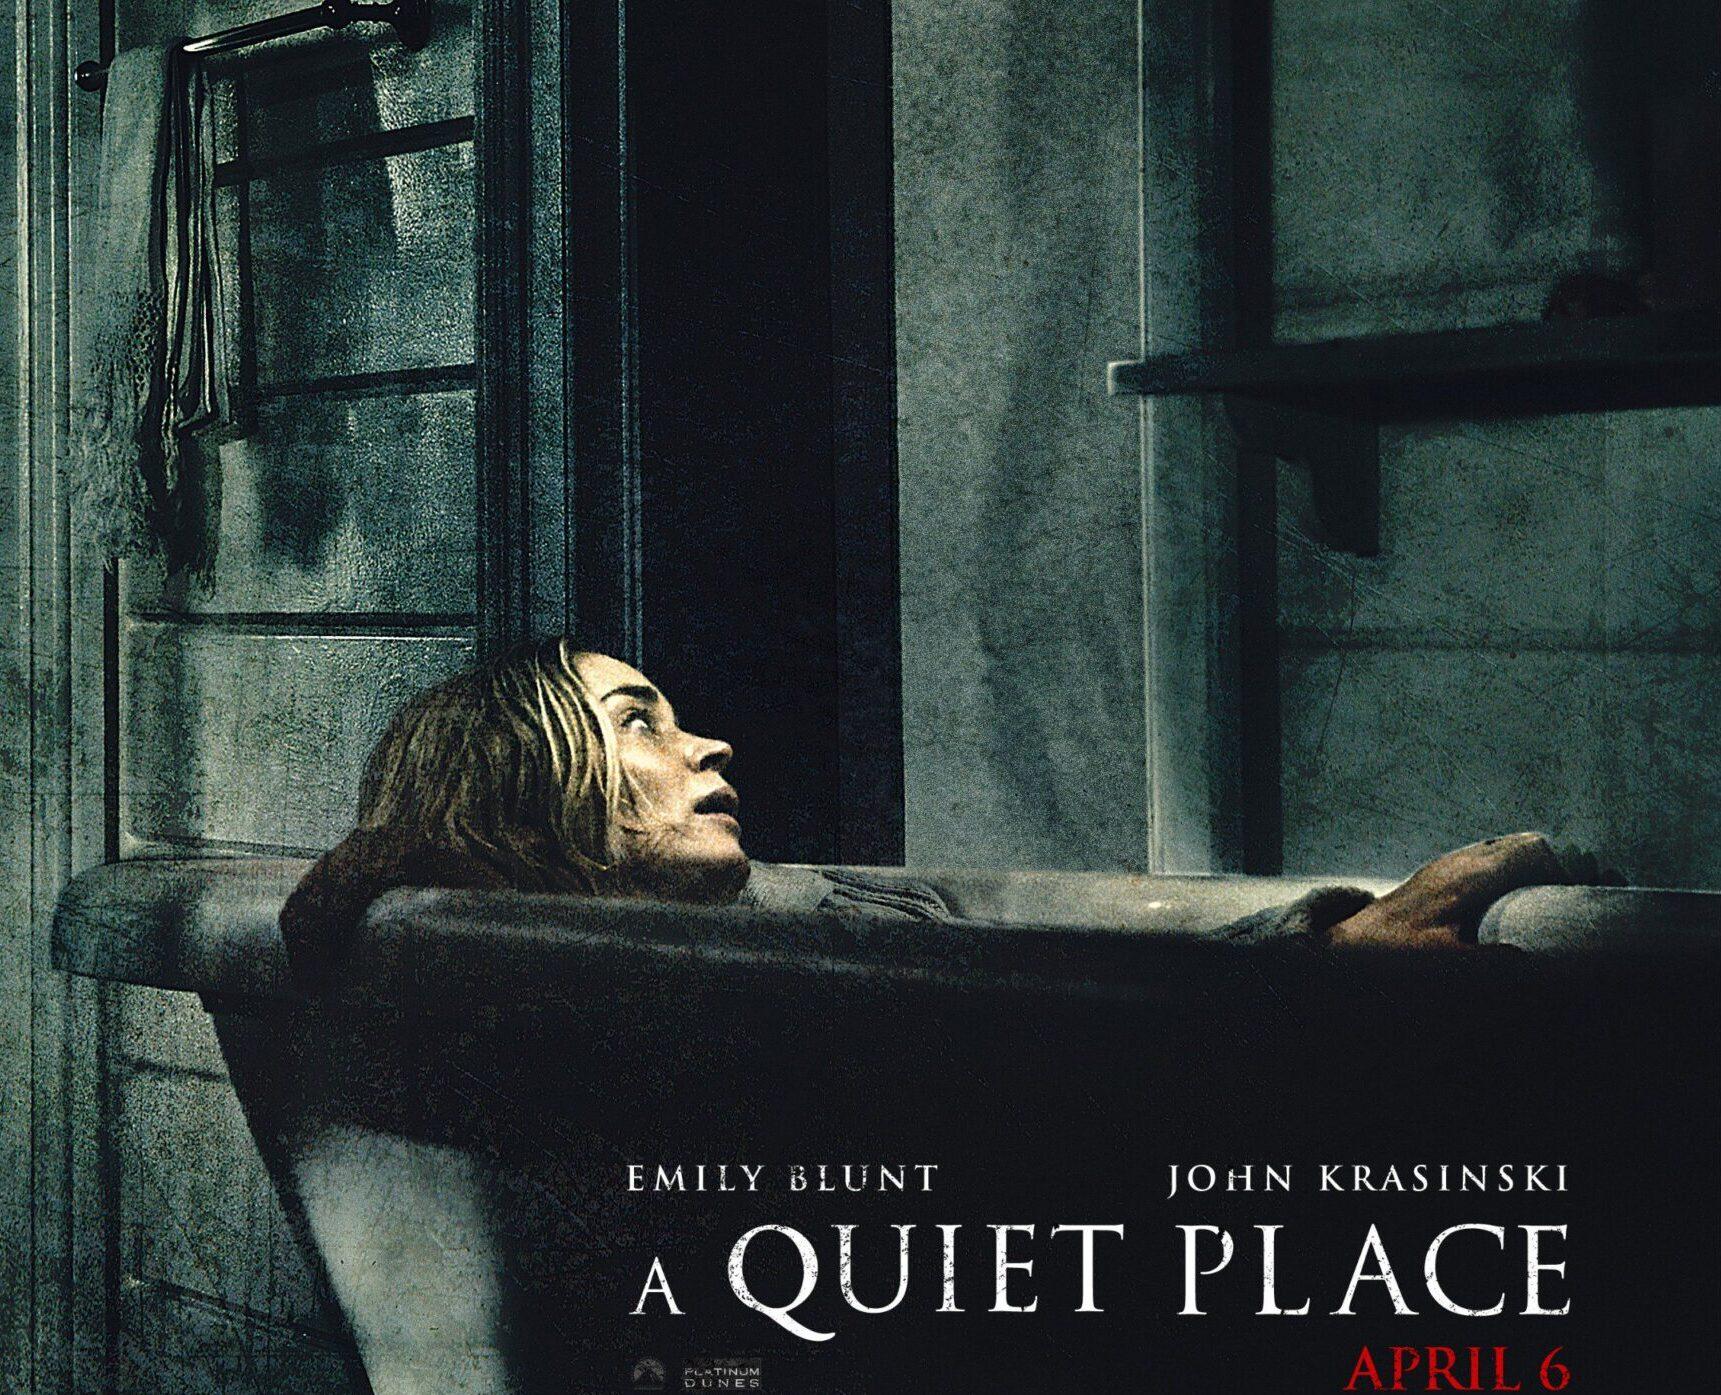 Sessiz Bir Yer (A Quiet Place)